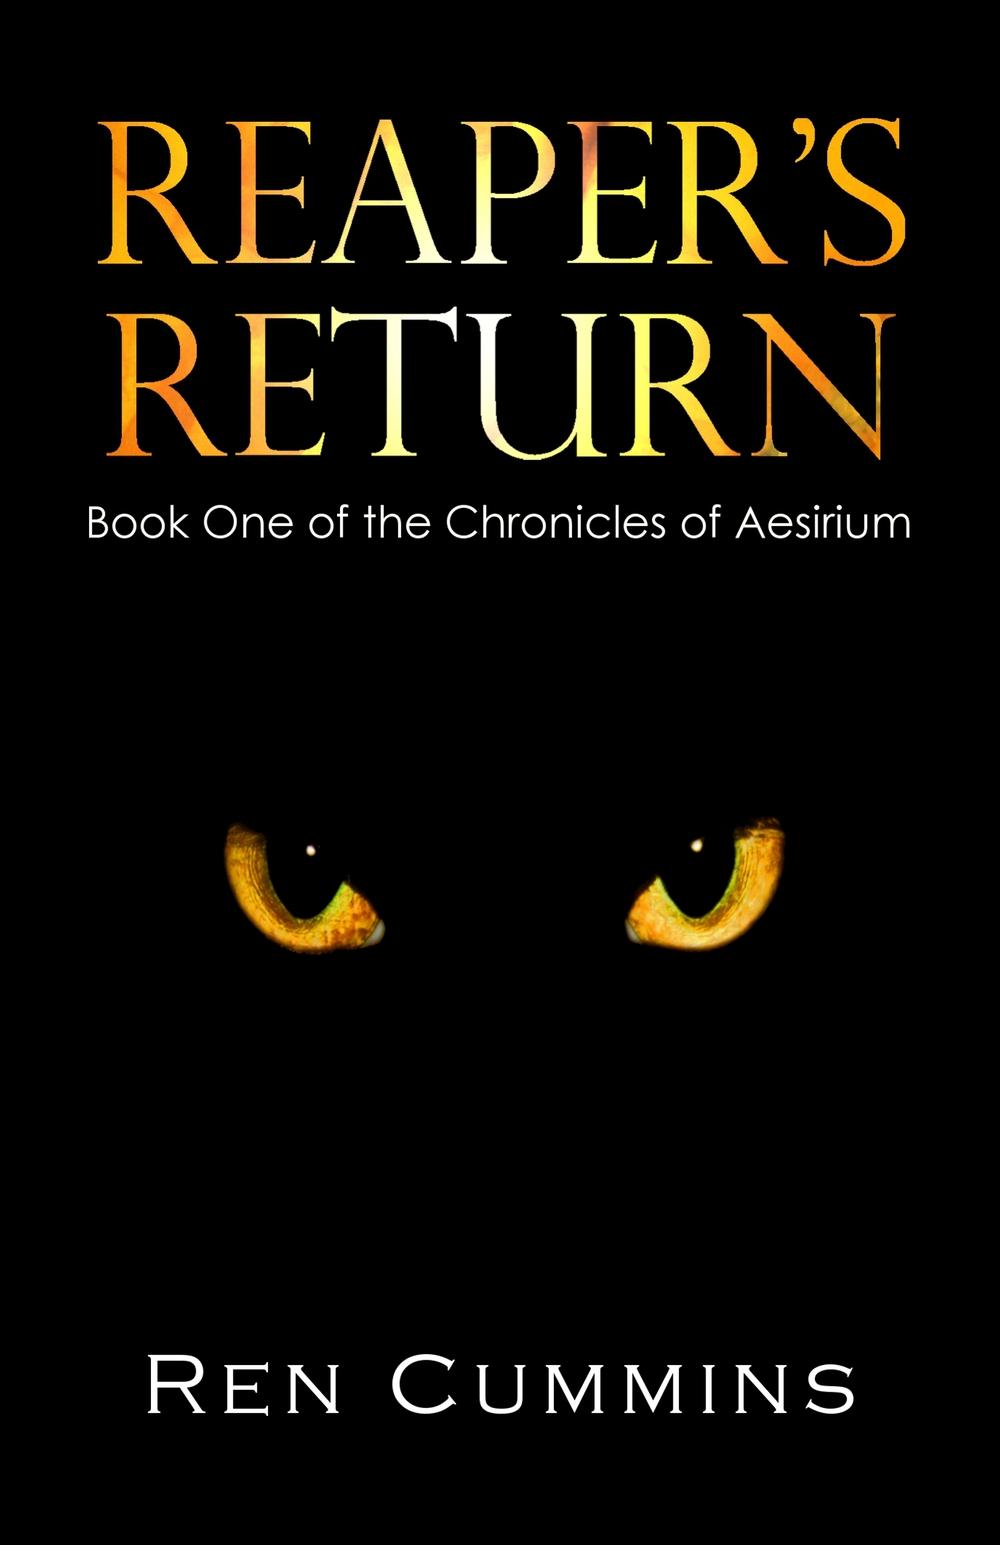 Reaper's Return